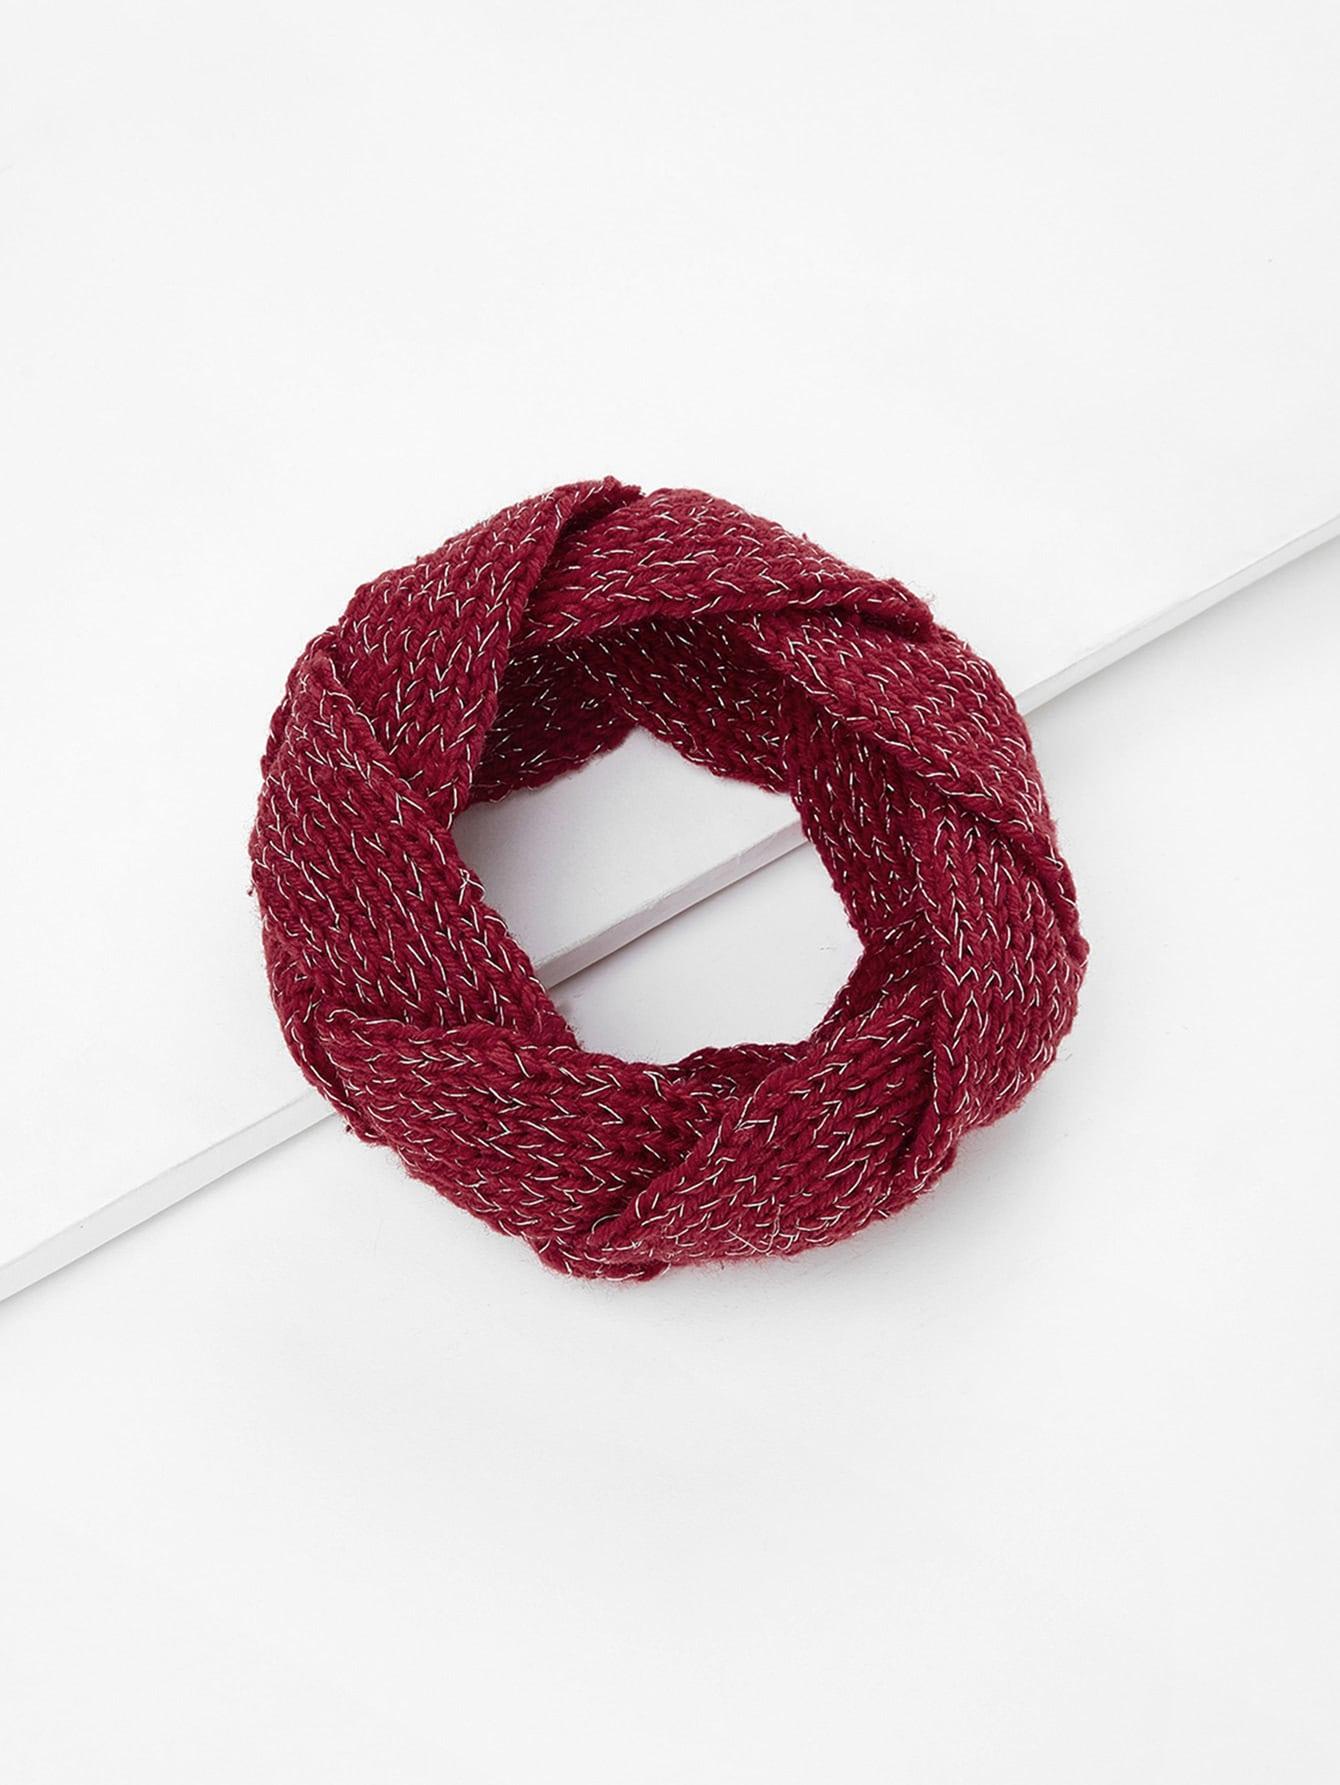 Knit Braided Headband